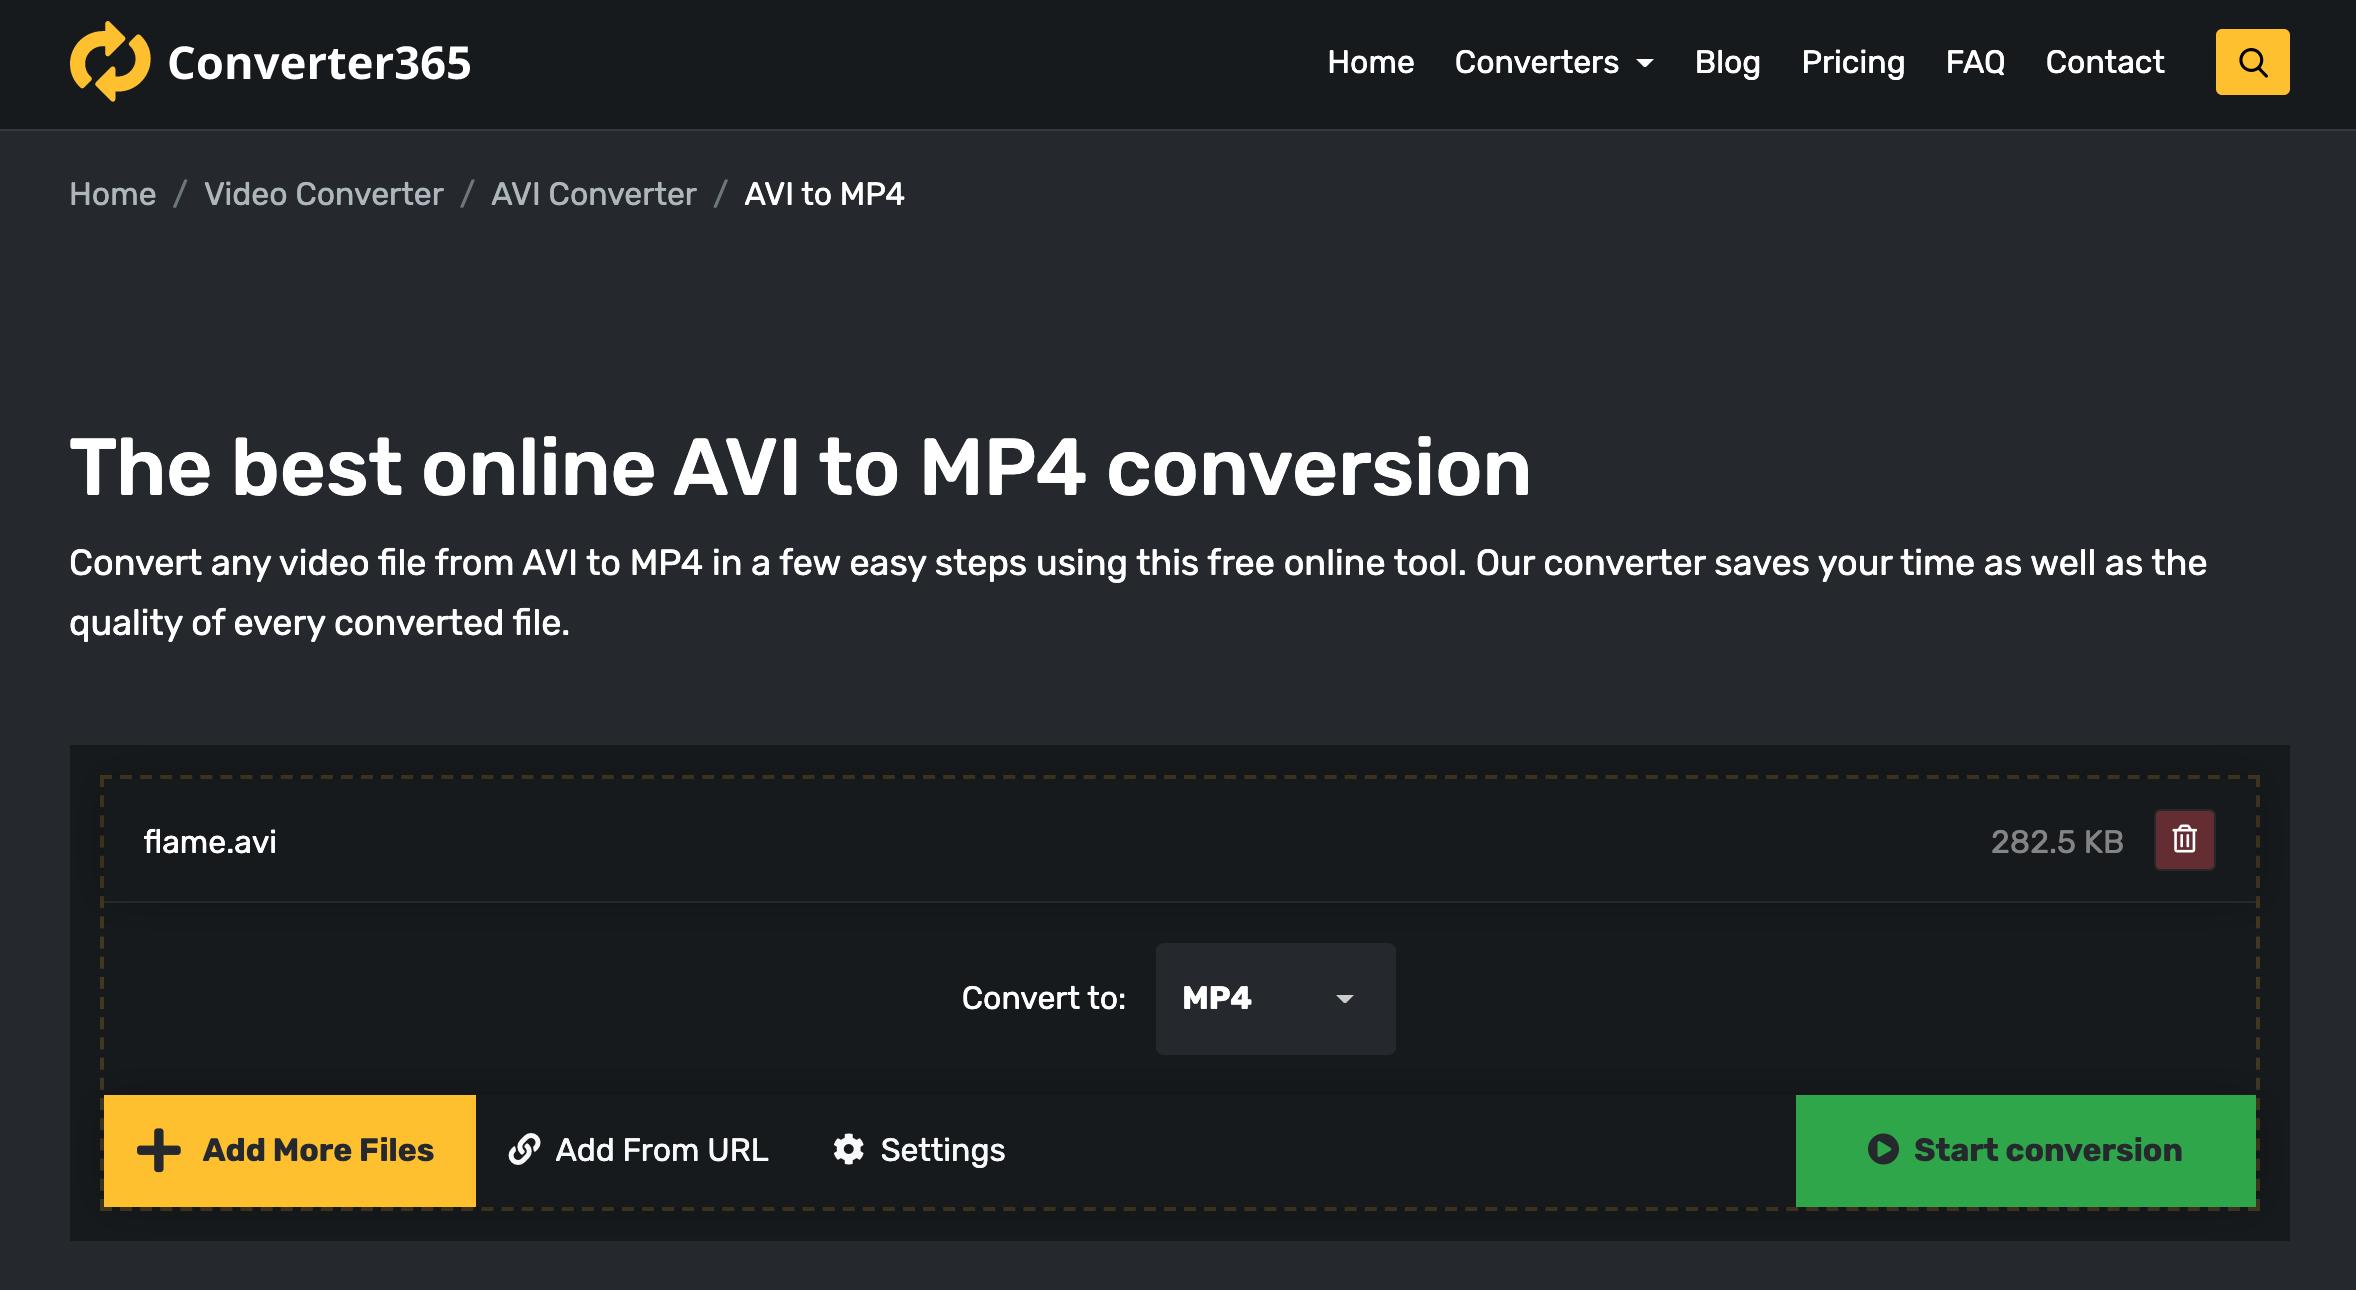 convert avi to mp4 converter365 step 1